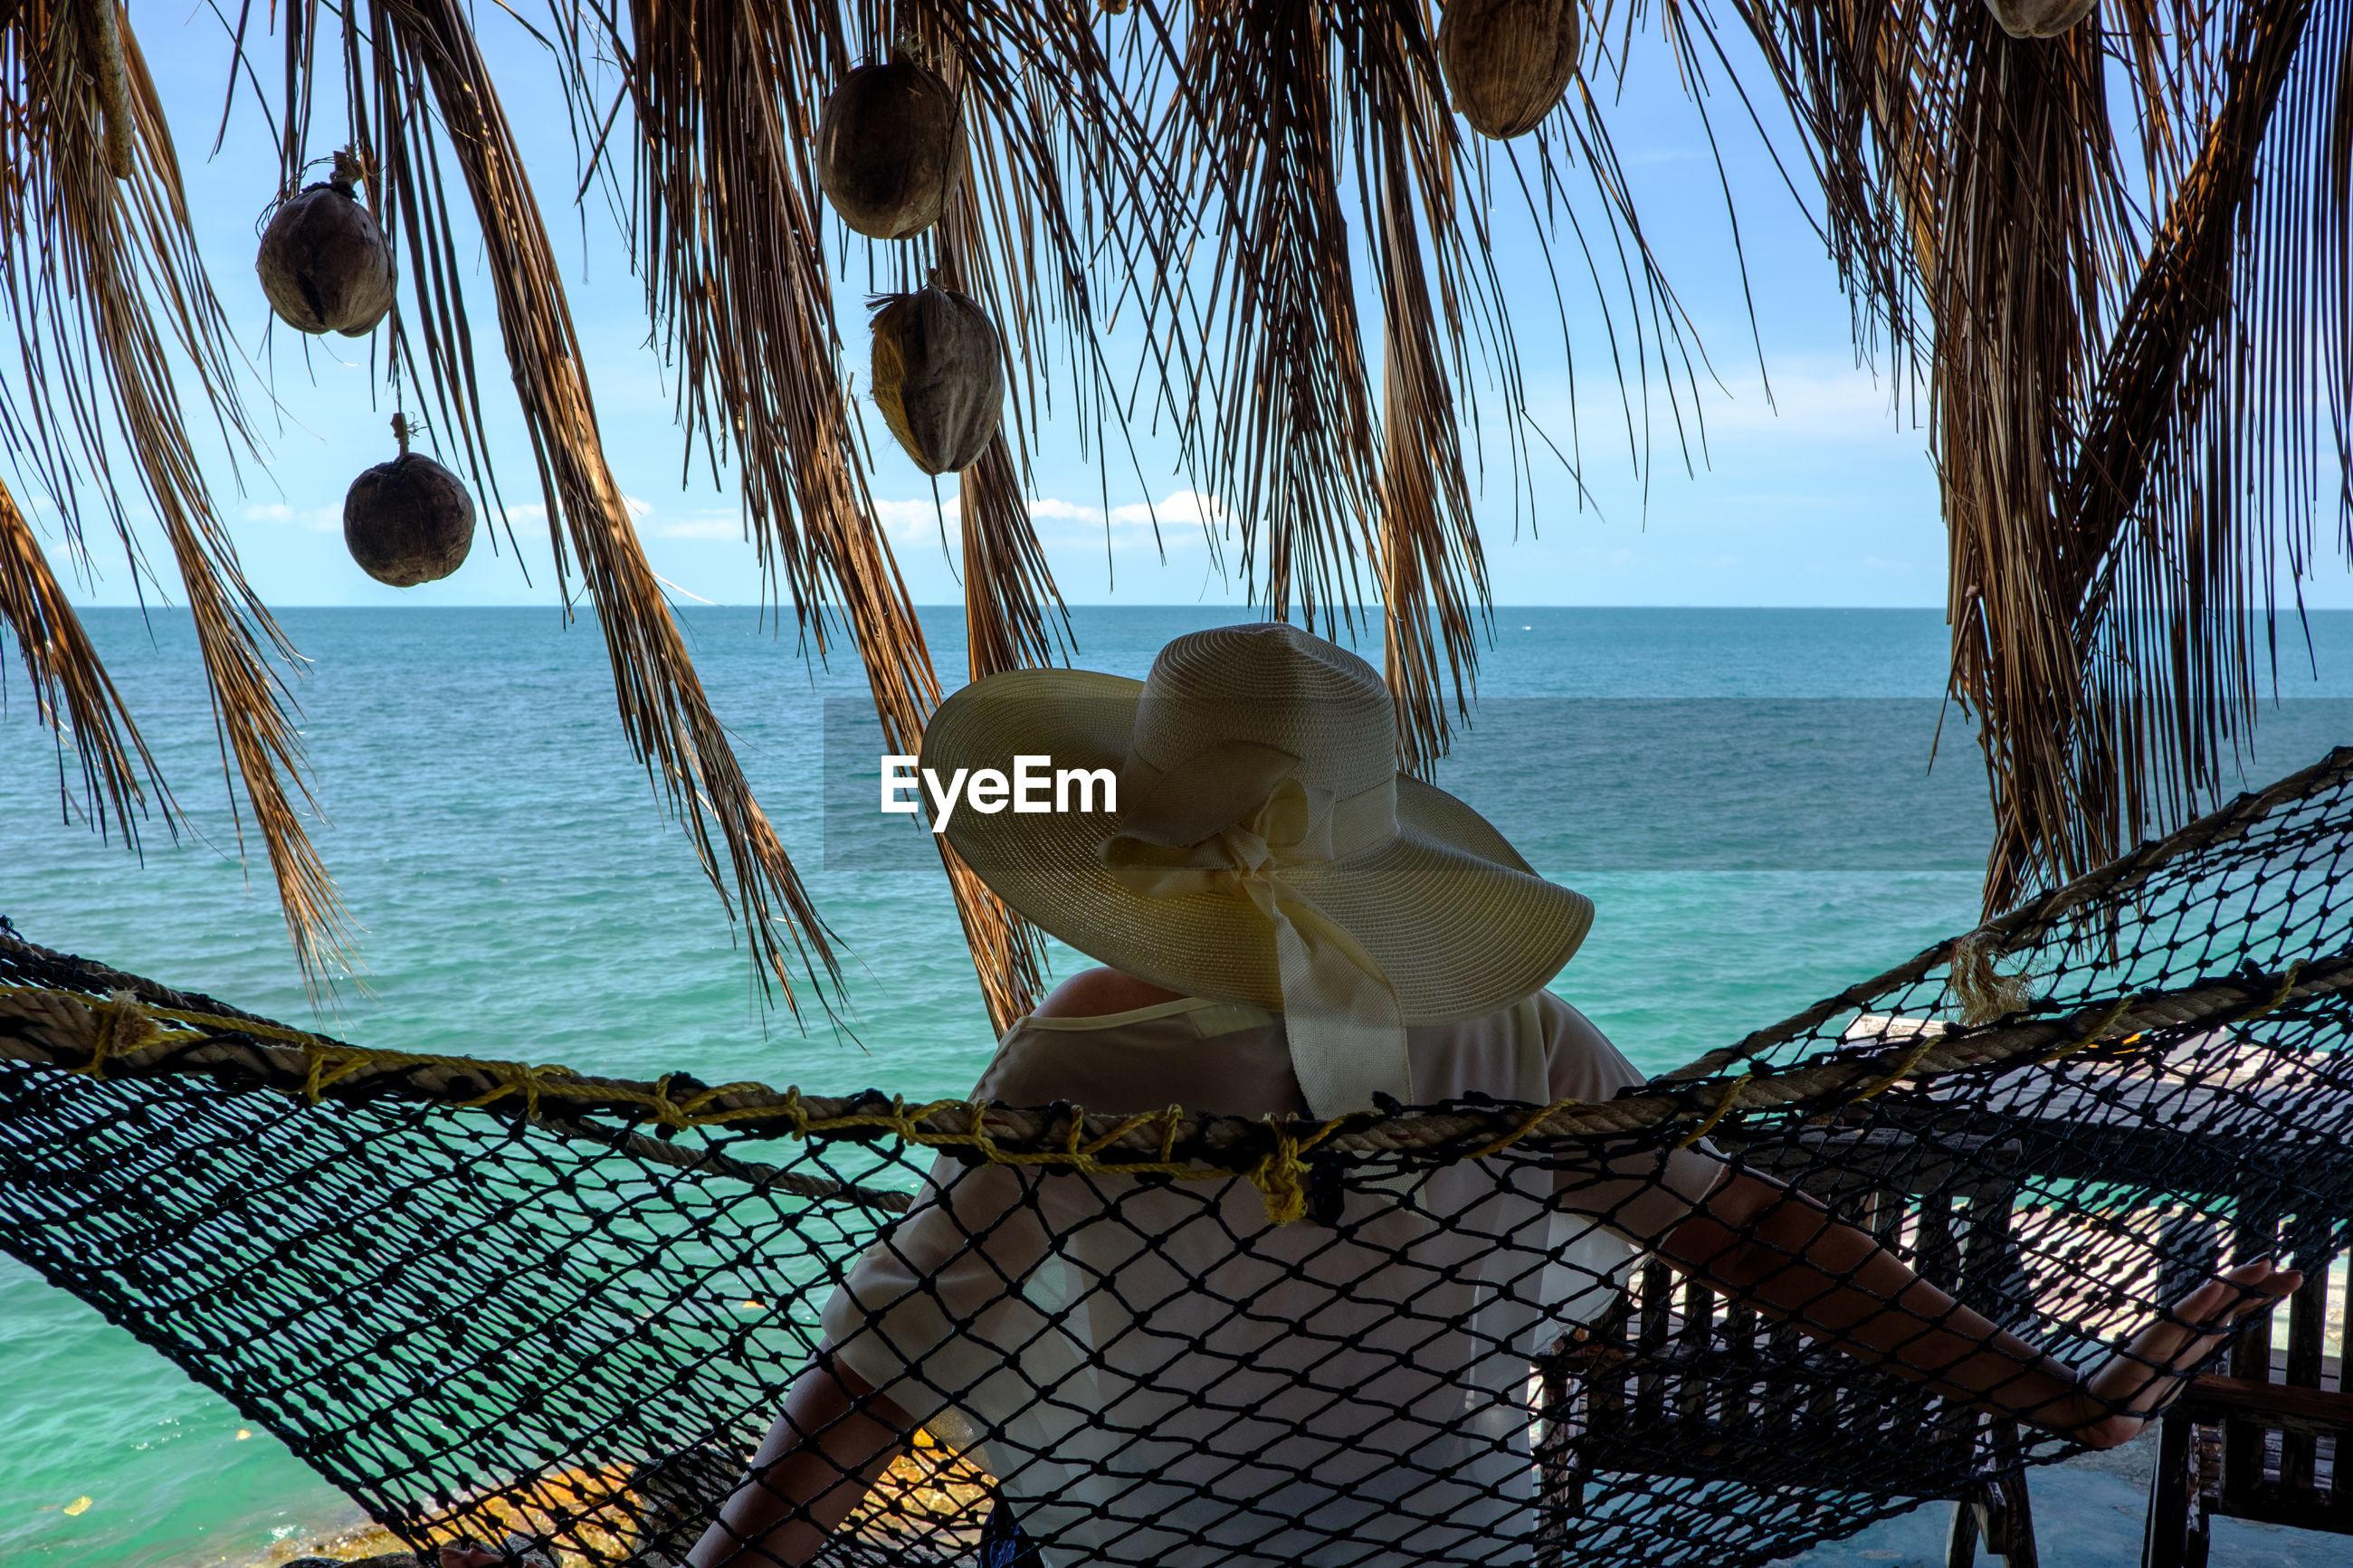 Woman sitting in hammock at beach